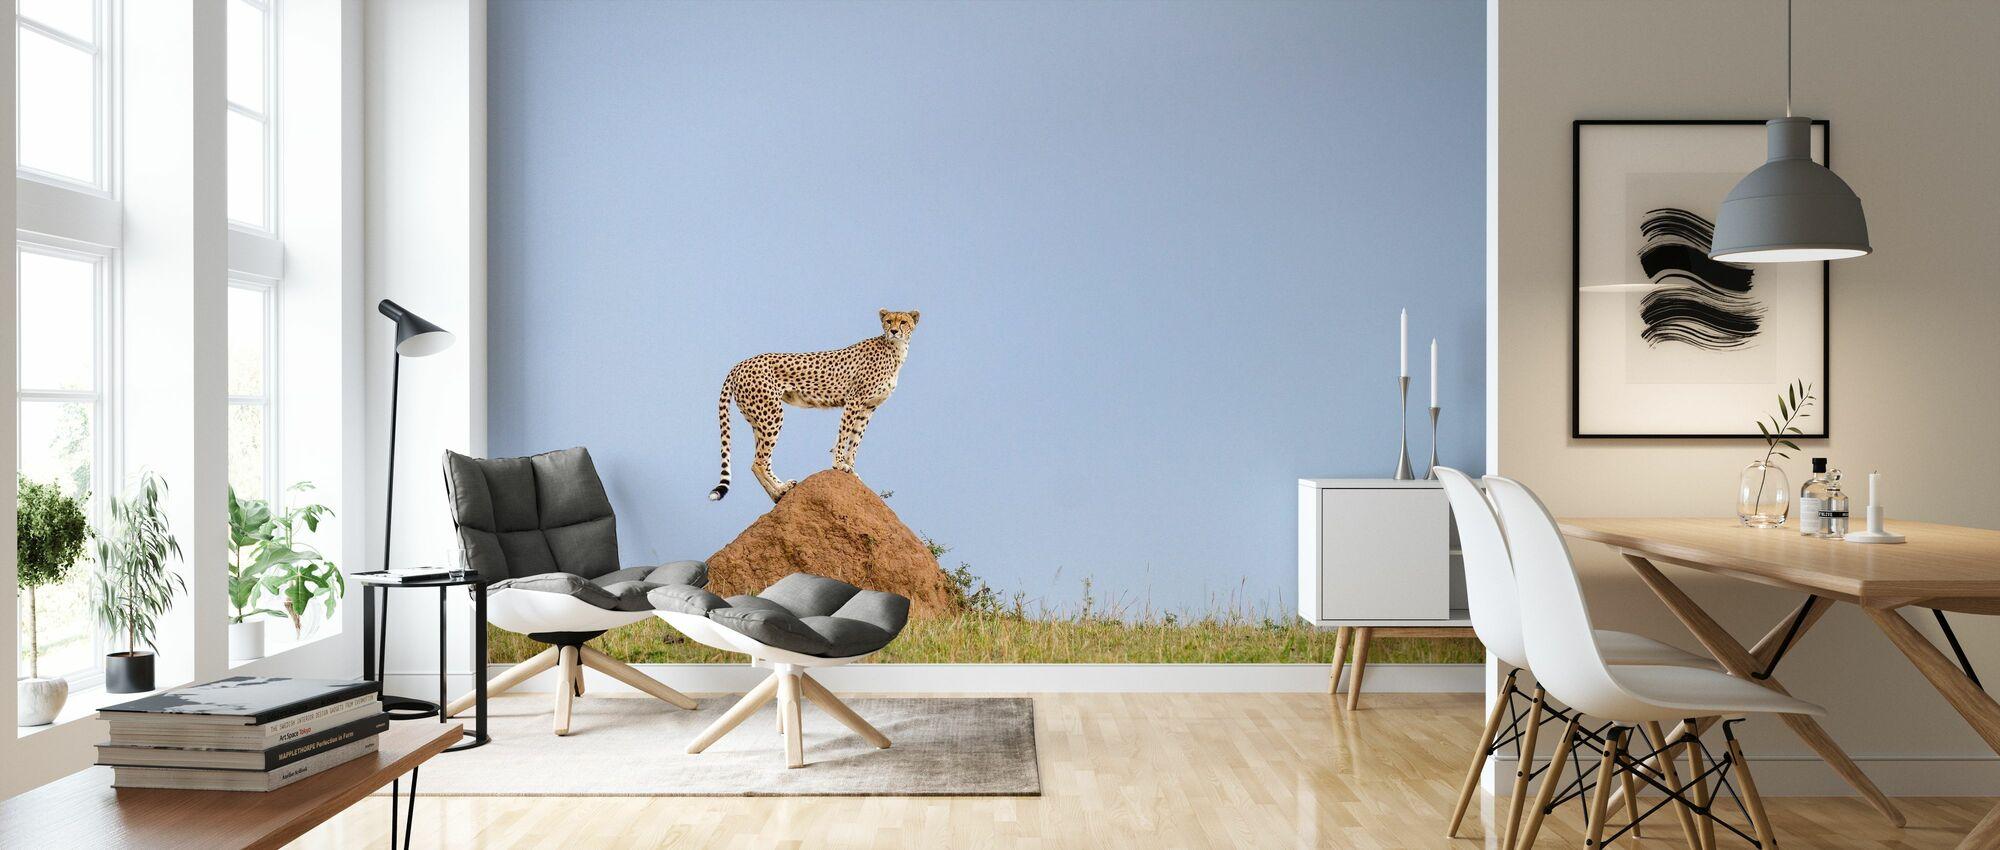 Cheetah on Mound - Wallpaper - Living Room